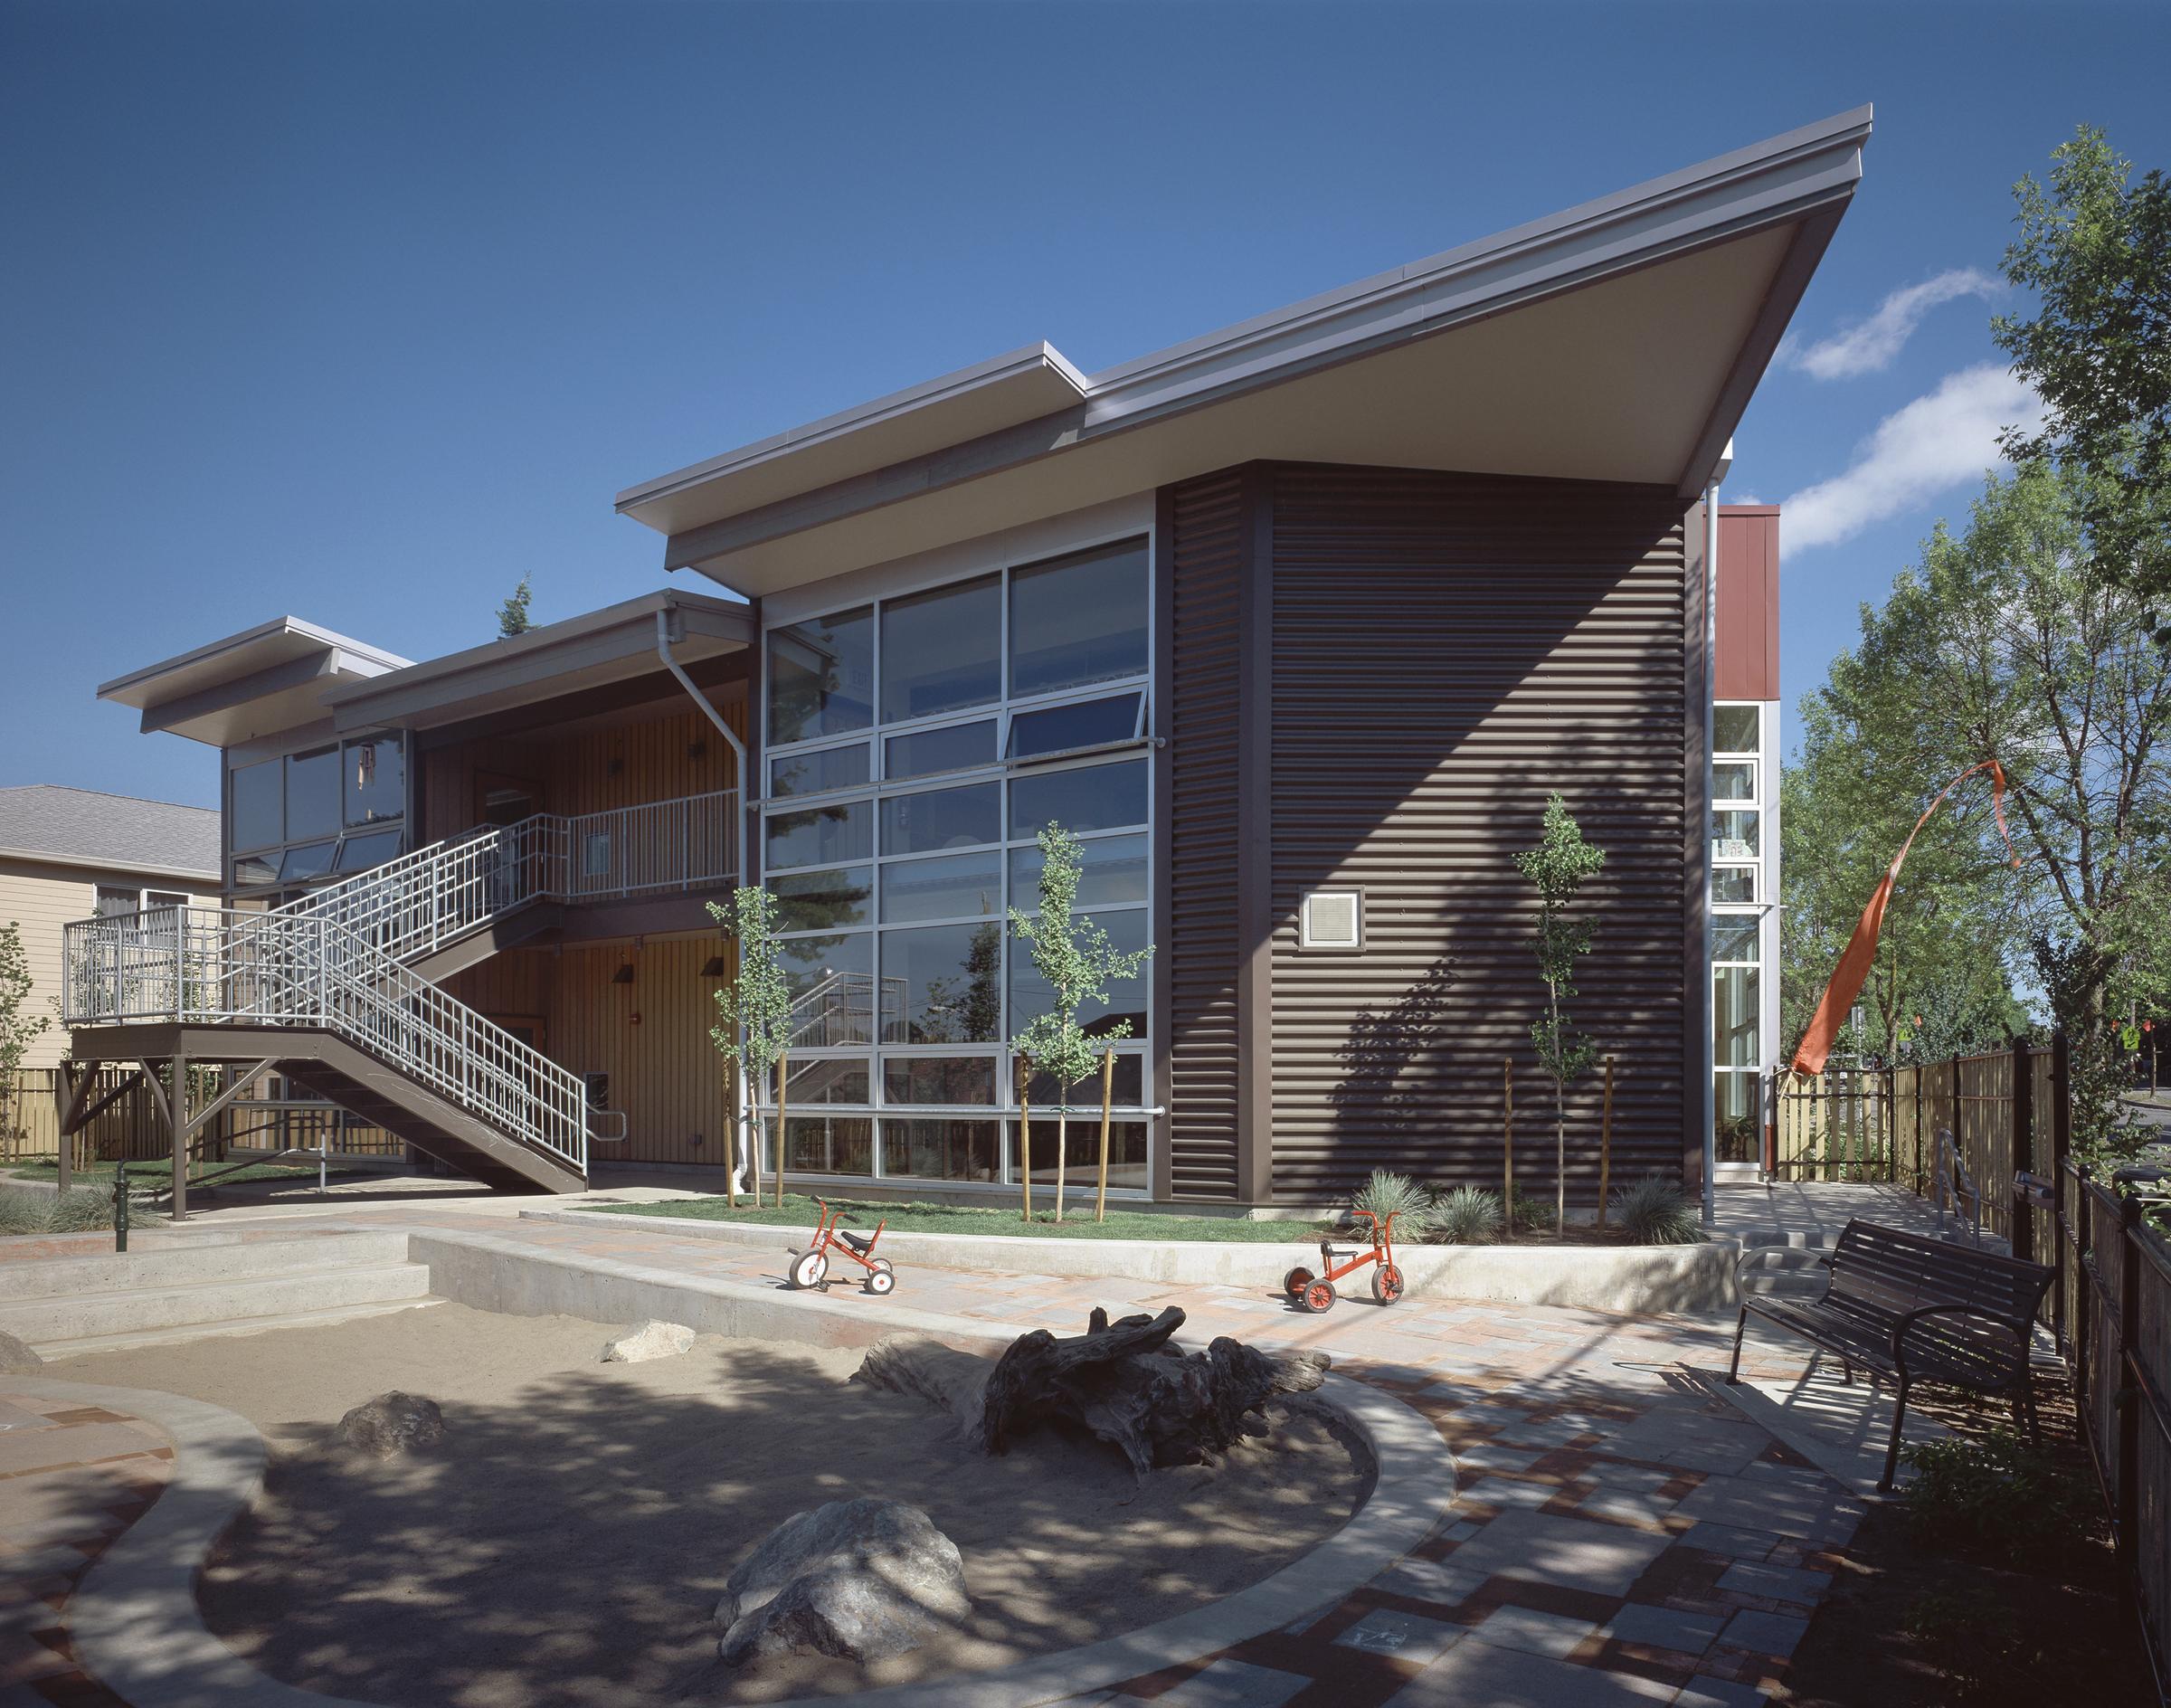 - Client: Catholic Community Services of Western WashingtonLocation: Seattle, WashingtonCompletion: 2004Project Size: 9,850 SF